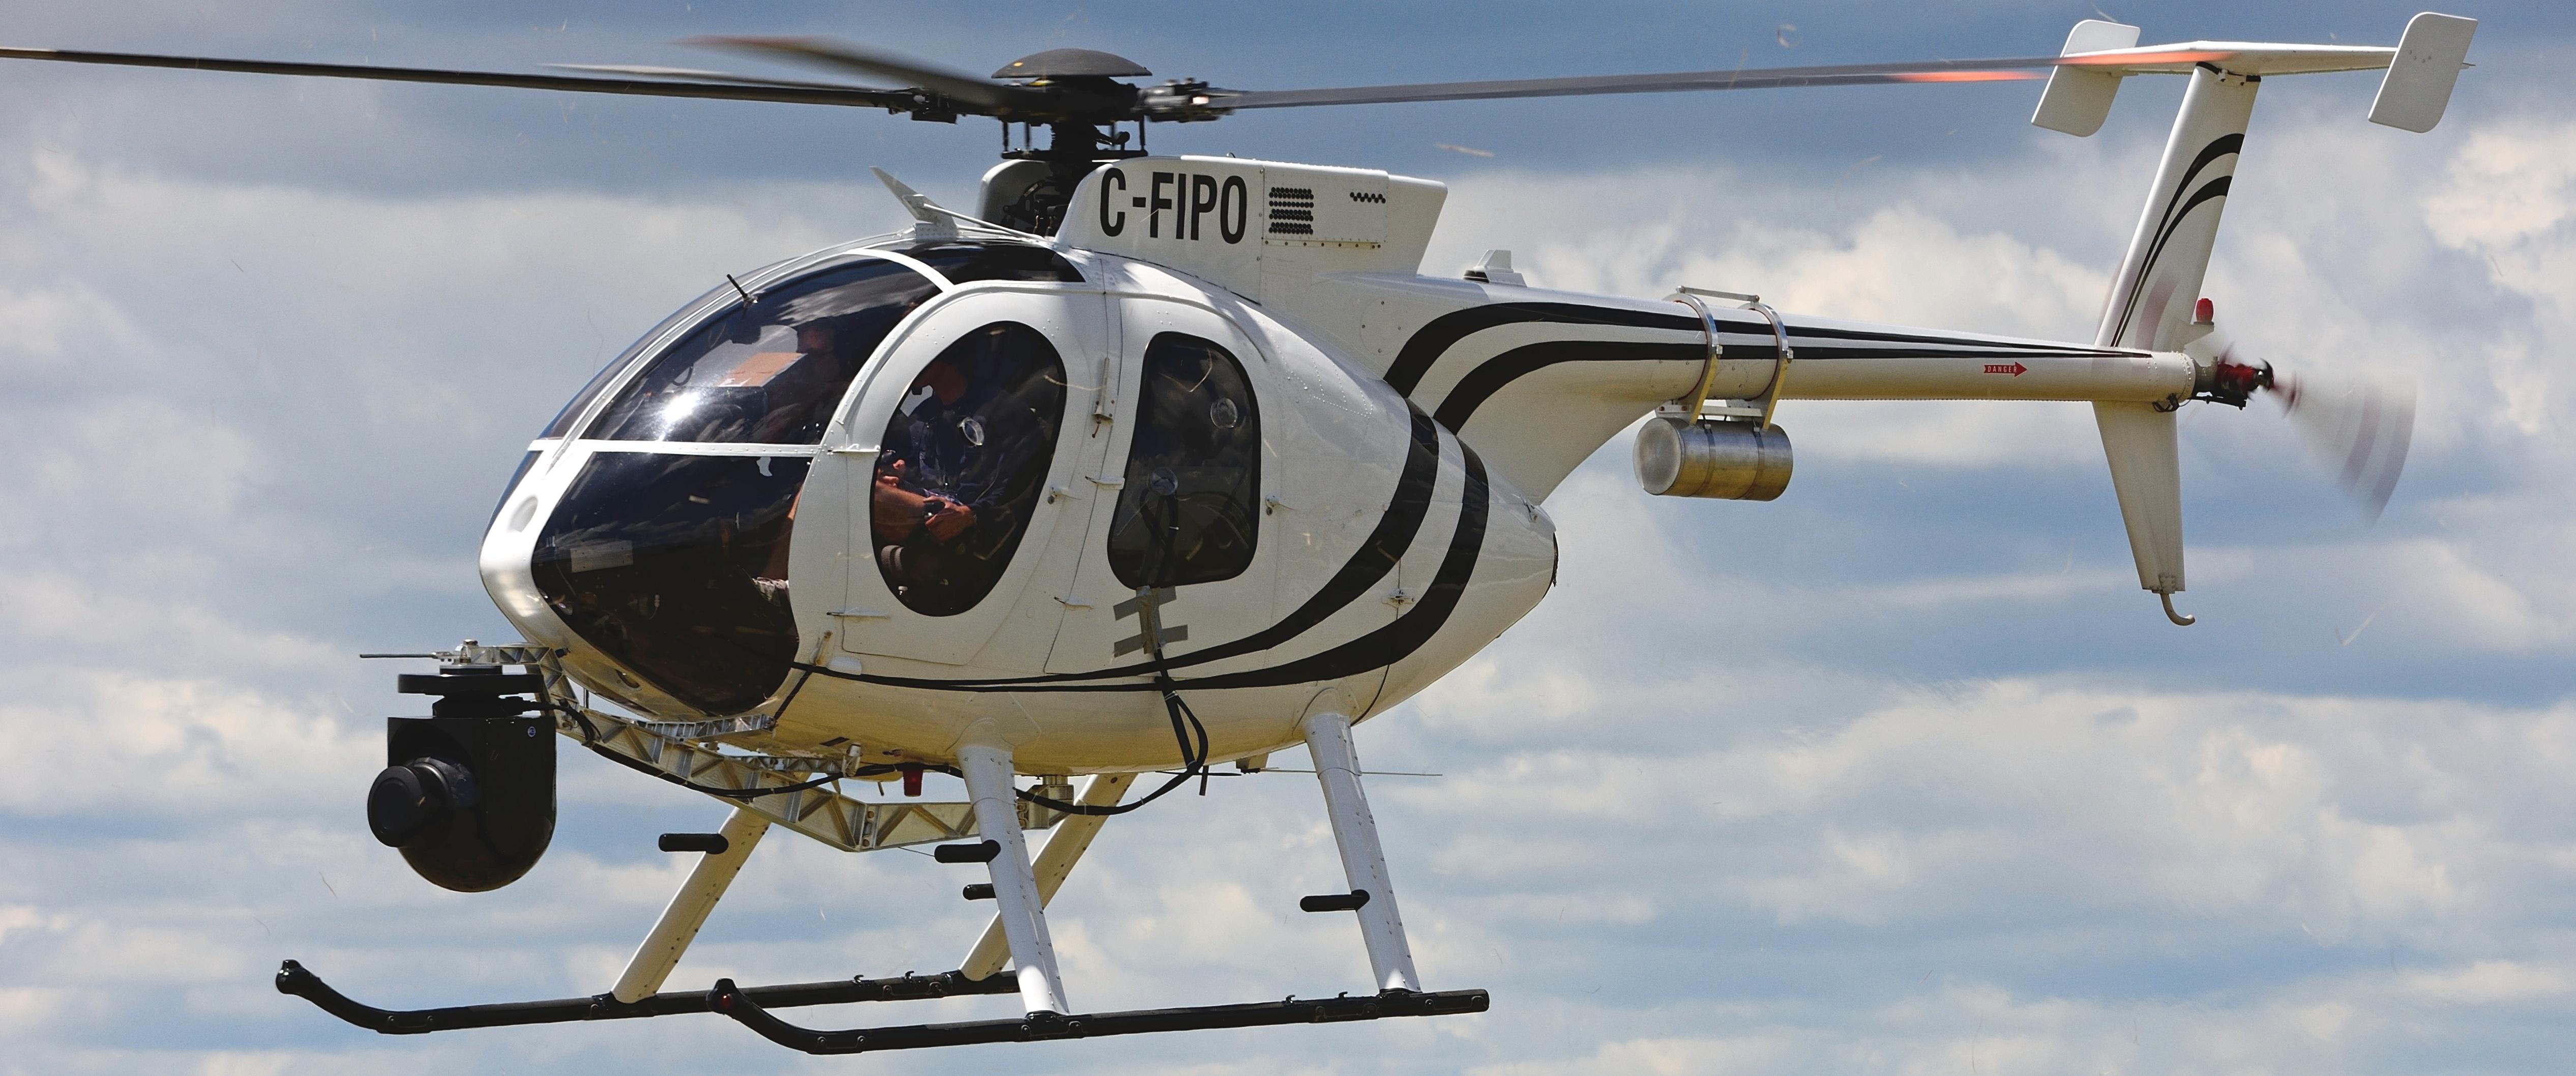 C-FIPO-GSS-520-Camera-1